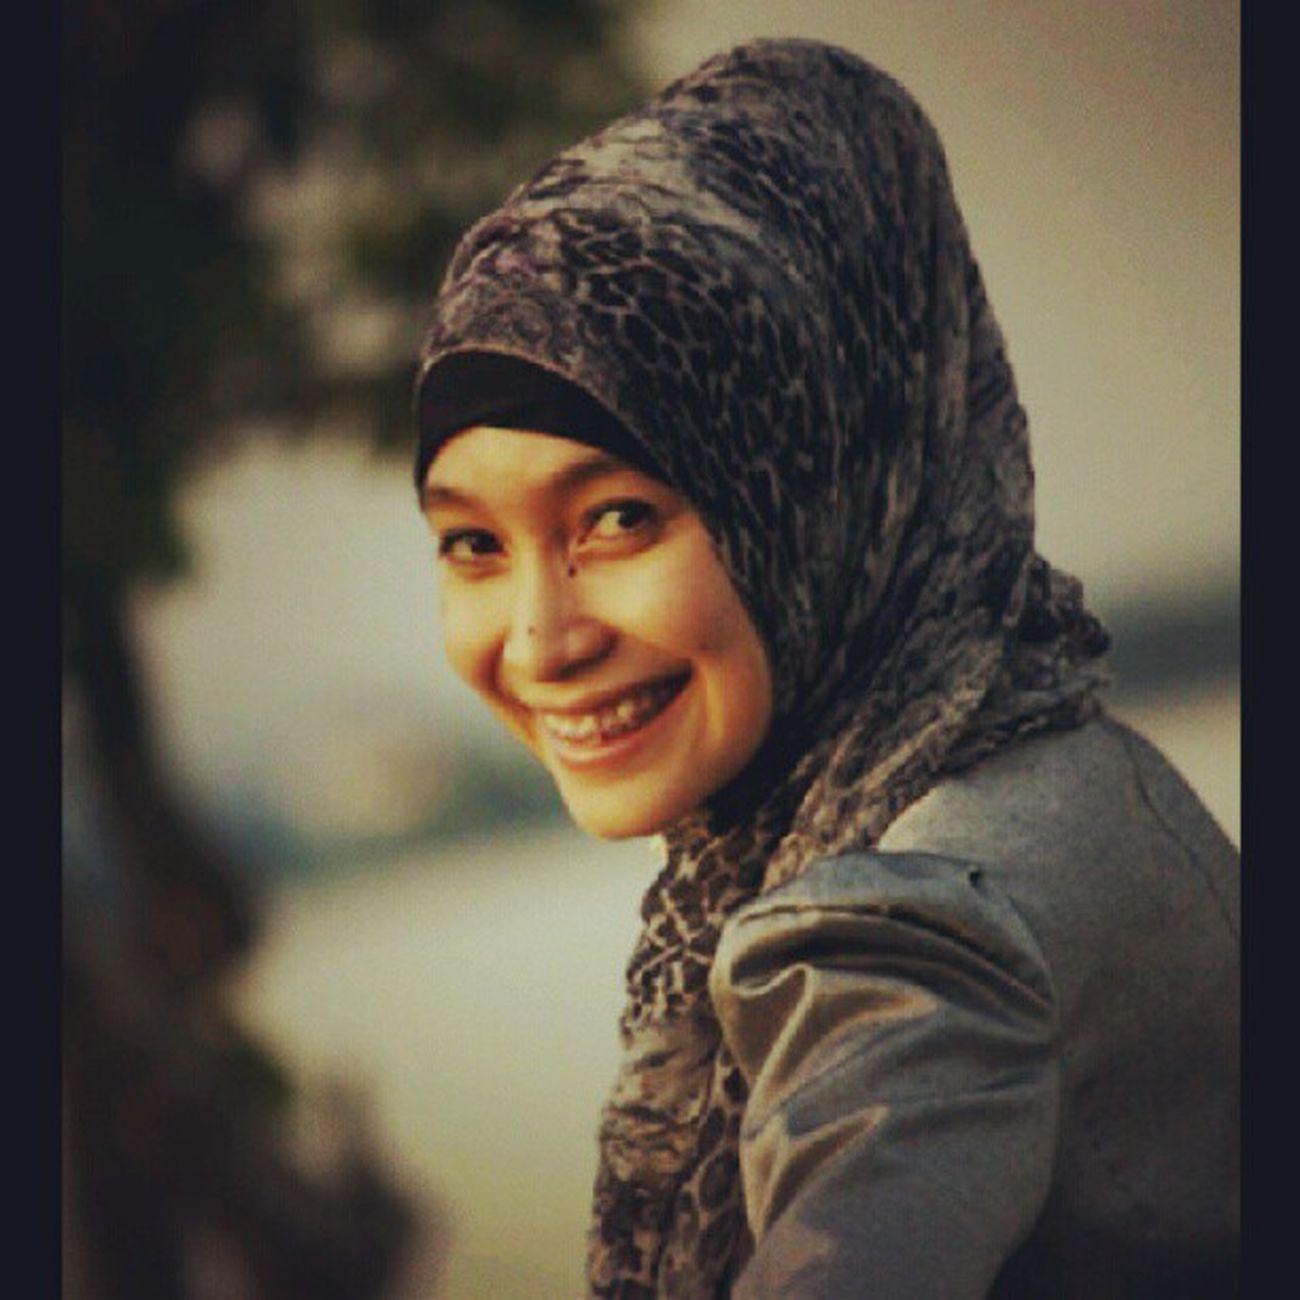 Hijab Jilbab Instamarinda Instagram instagram indonesia samarinda model girl model